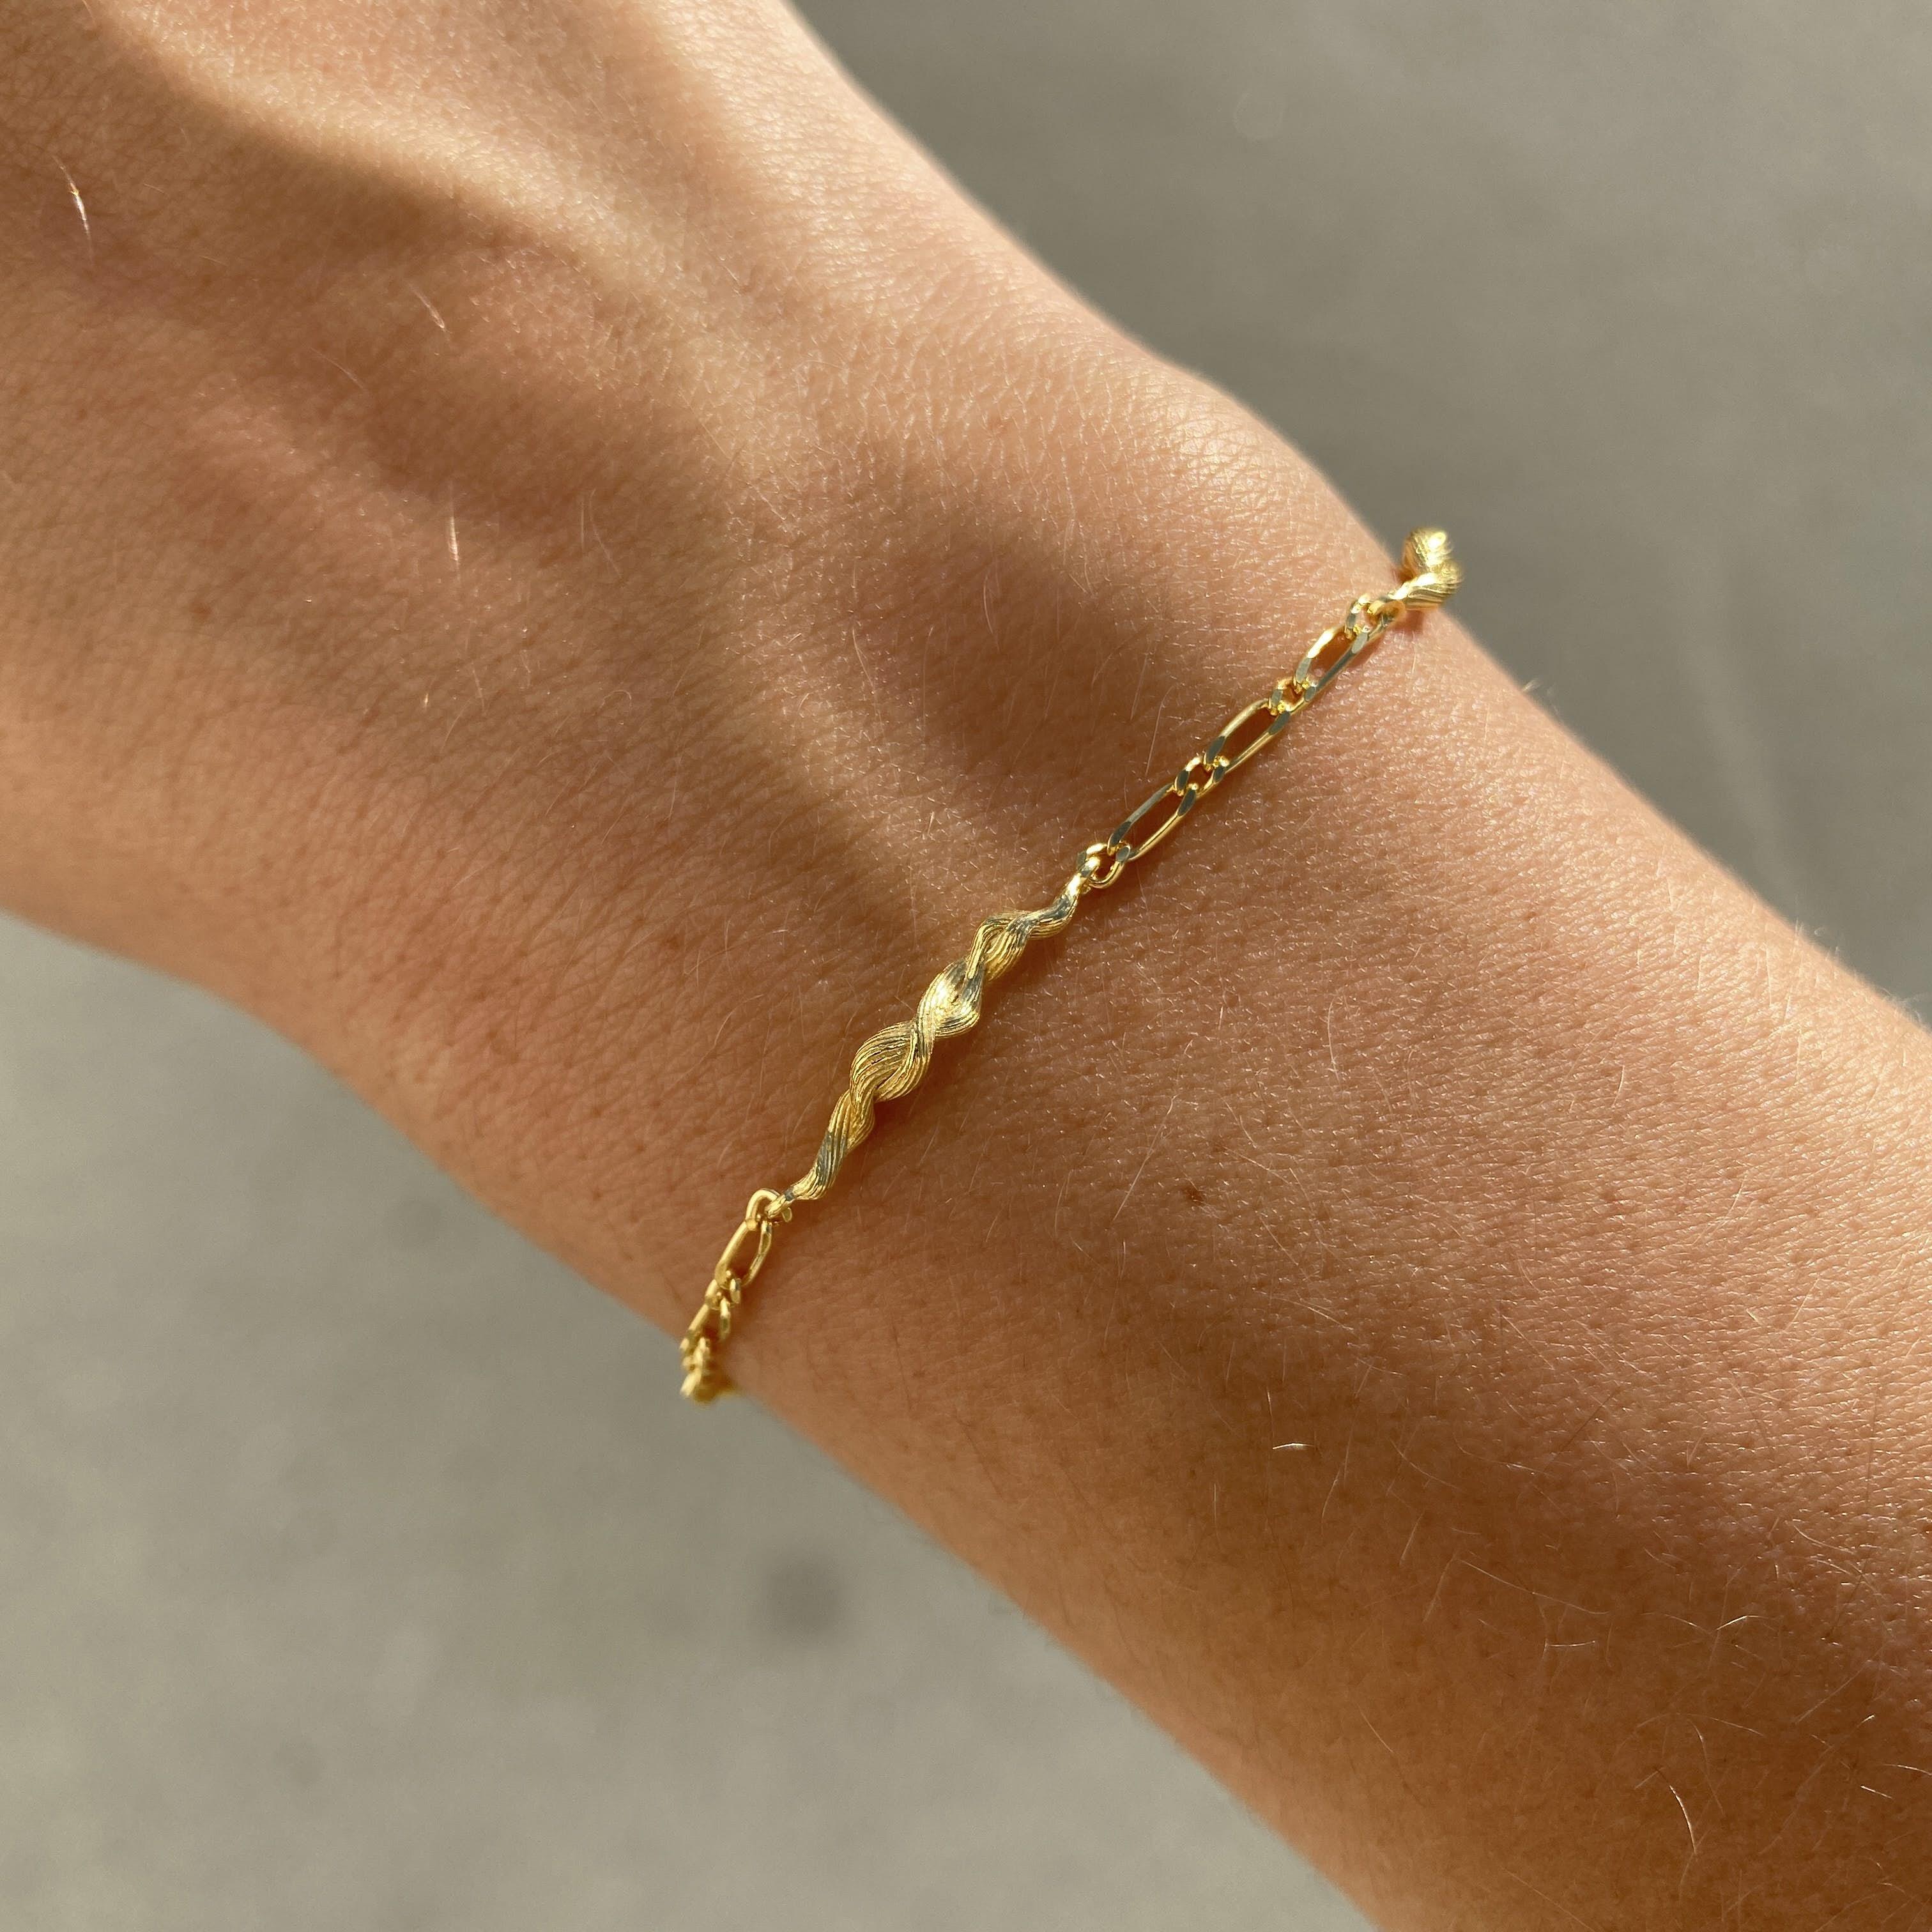 Ara Bracelet von Maanesten in Vergoldet-Silber Sterling 925